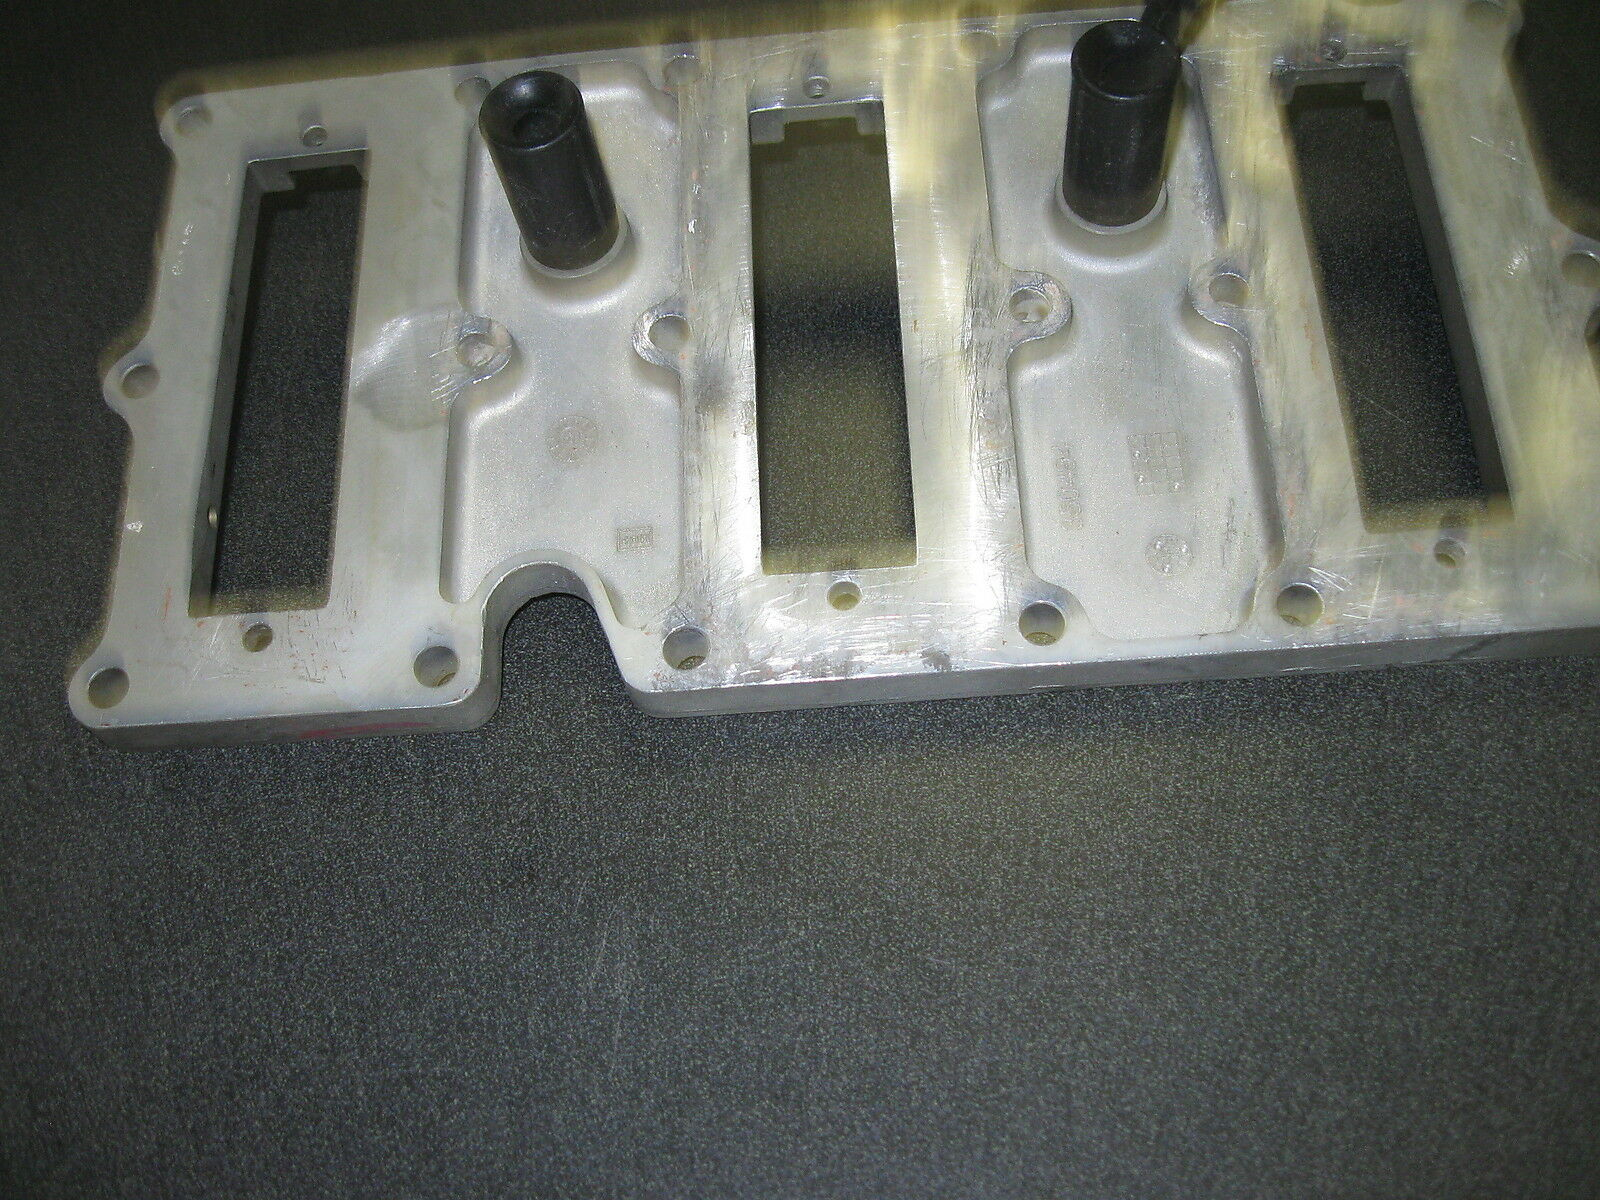 Evinrude Evinrude Evinrude Outboard 75HP E-Tec Reed Platte Montage Teilenummer 5005282 5537bd